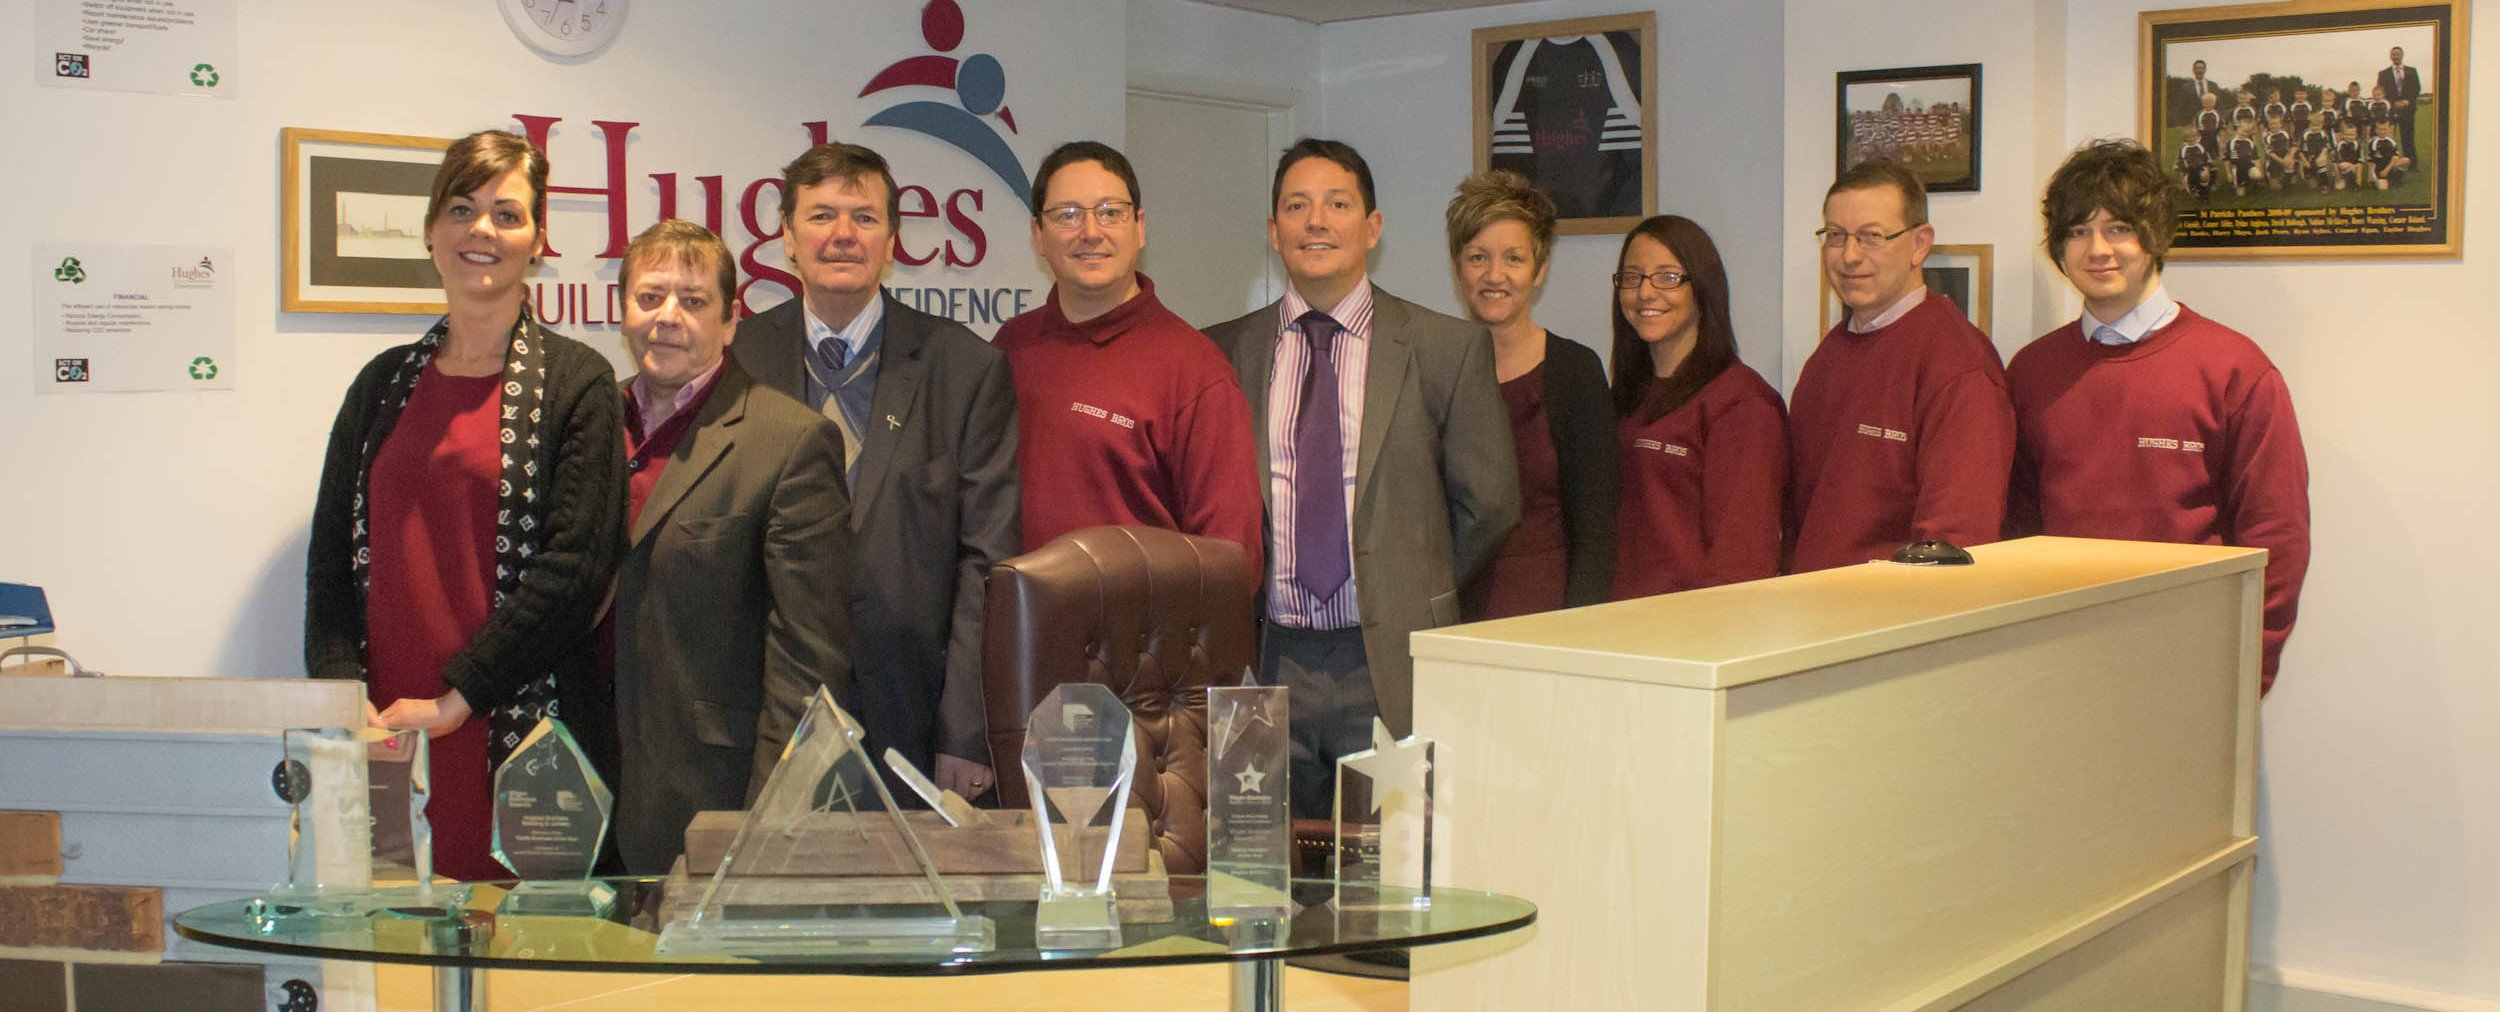 Team of professionals at Hughes